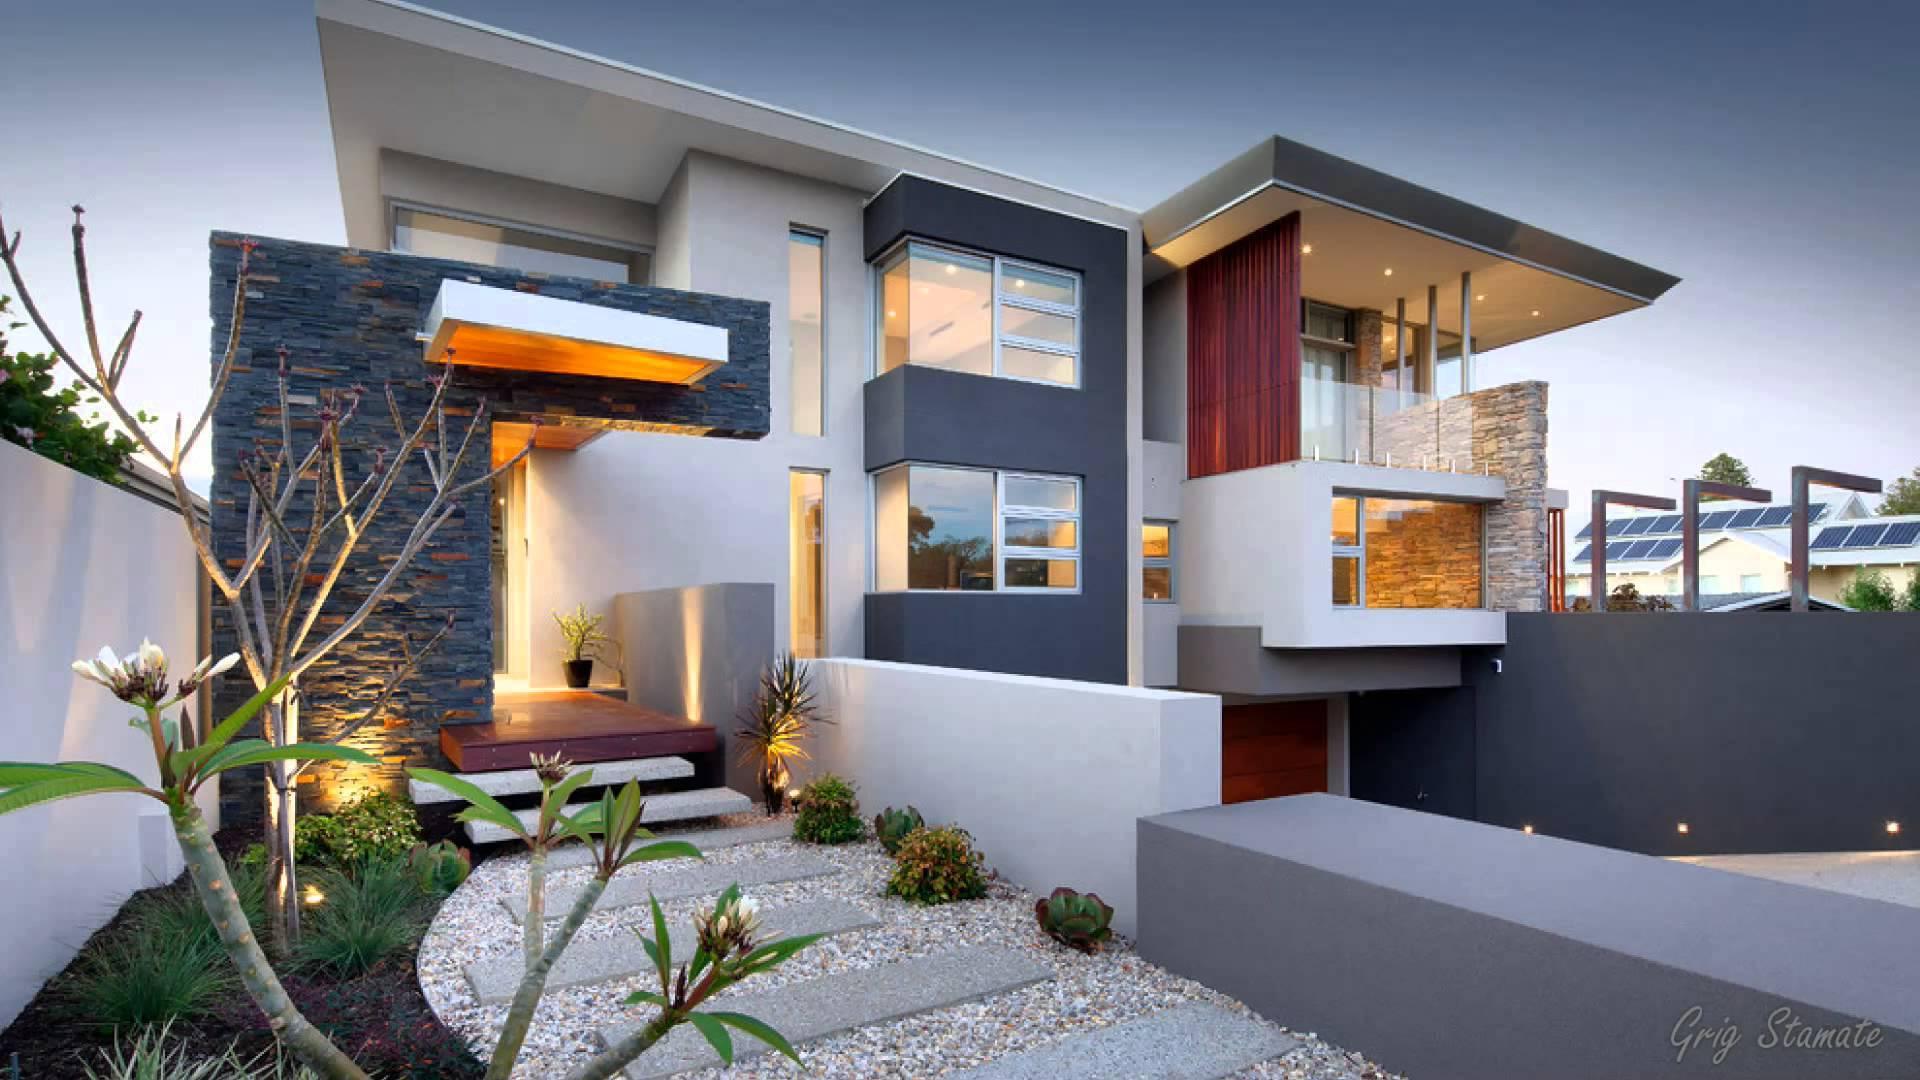 Beautiful Modern Home Design Ideas One House Plans 89455